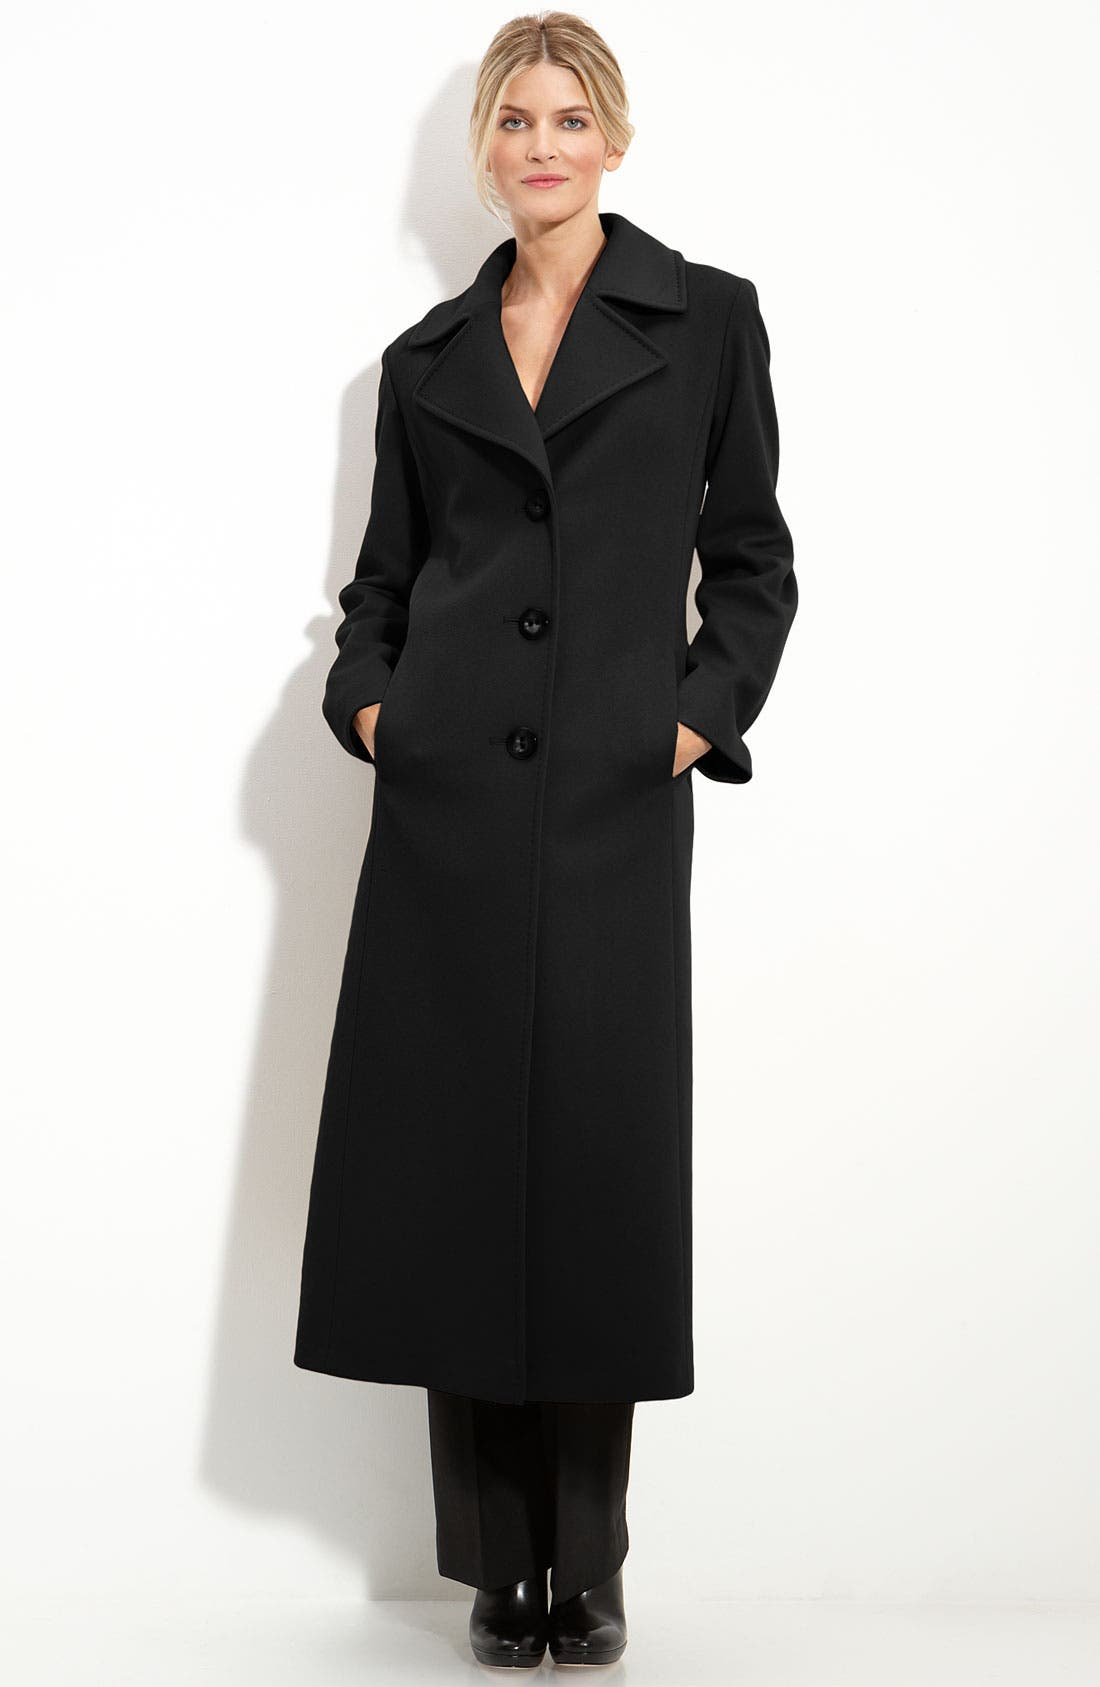 Main Image - Fleurette Single Breasted Wool Coat